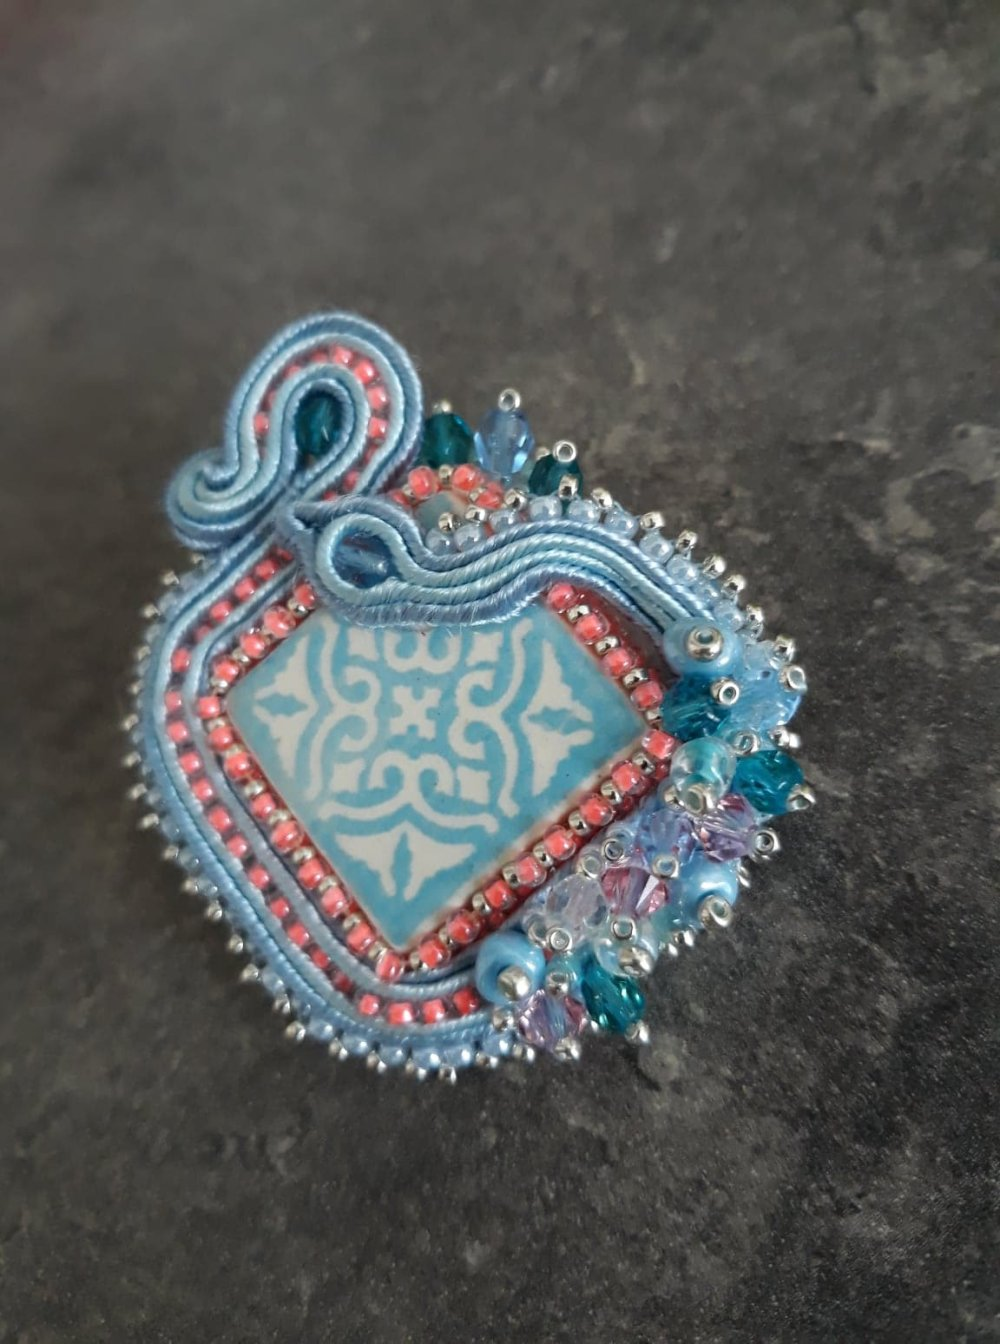 Broche azulejo en soutache, céramique et broderie de perles